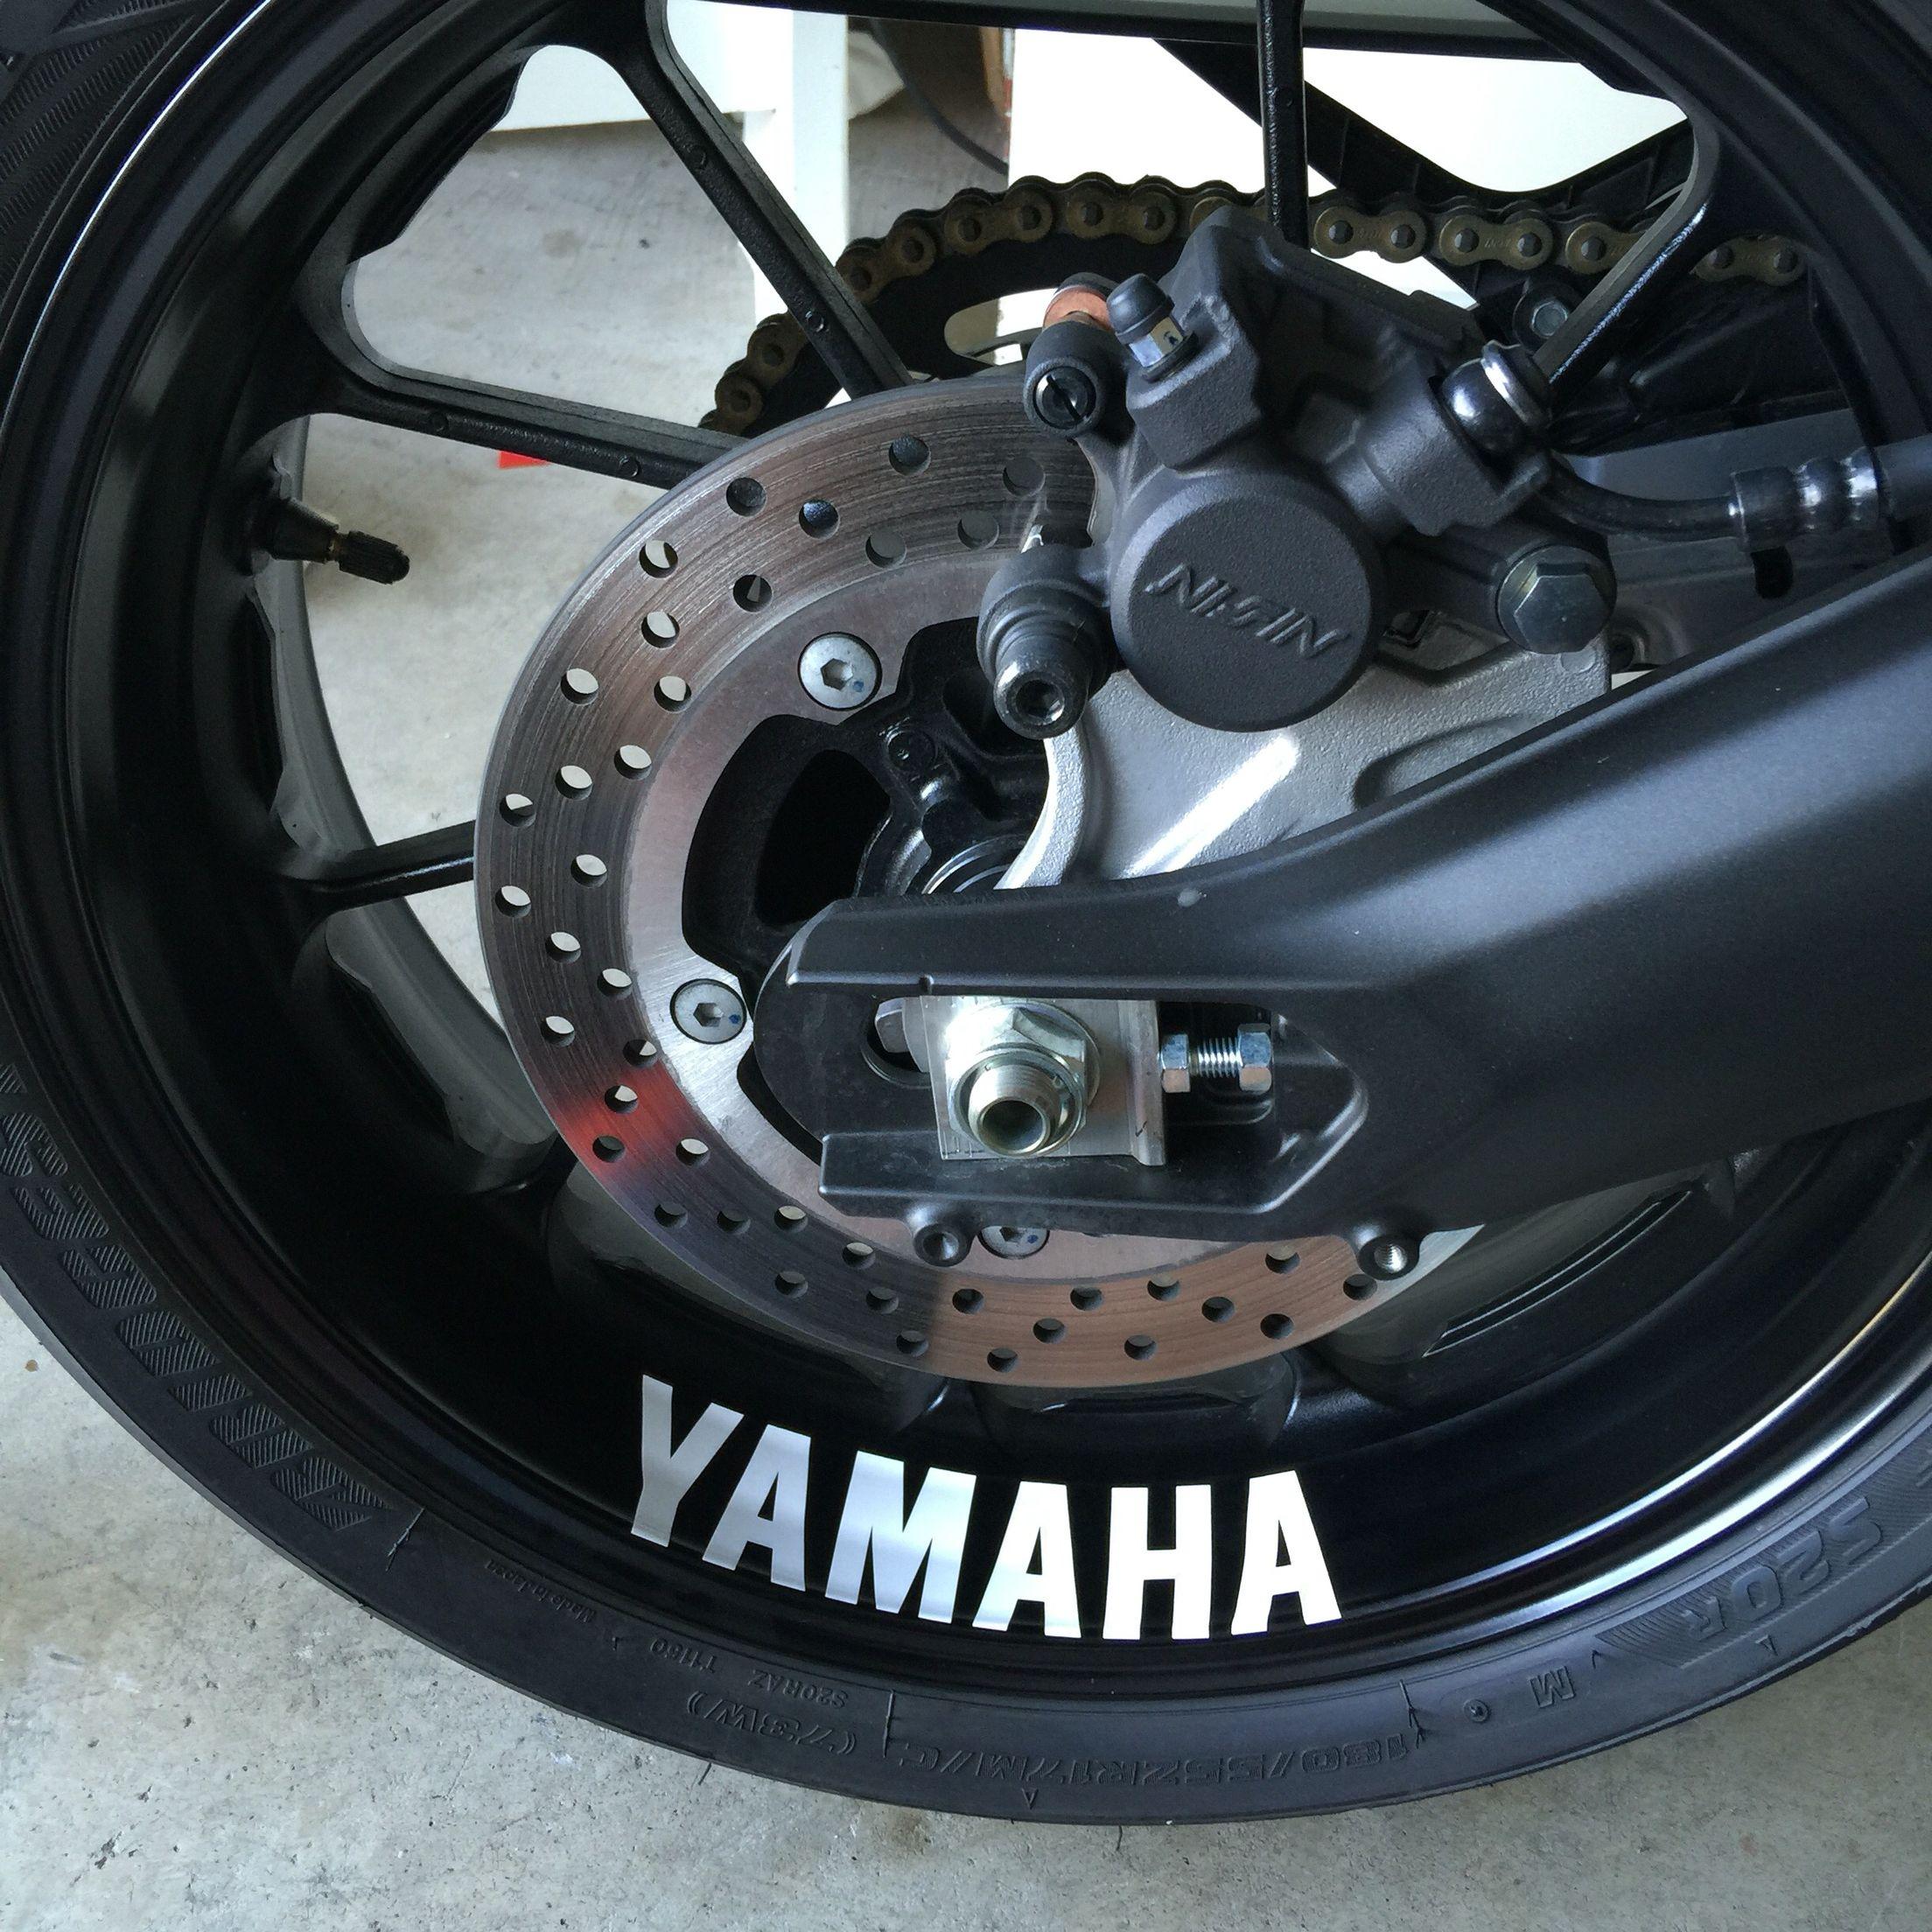 Yamaha bike sticker designs - Yamaha Rim Sticker On My Fz 09